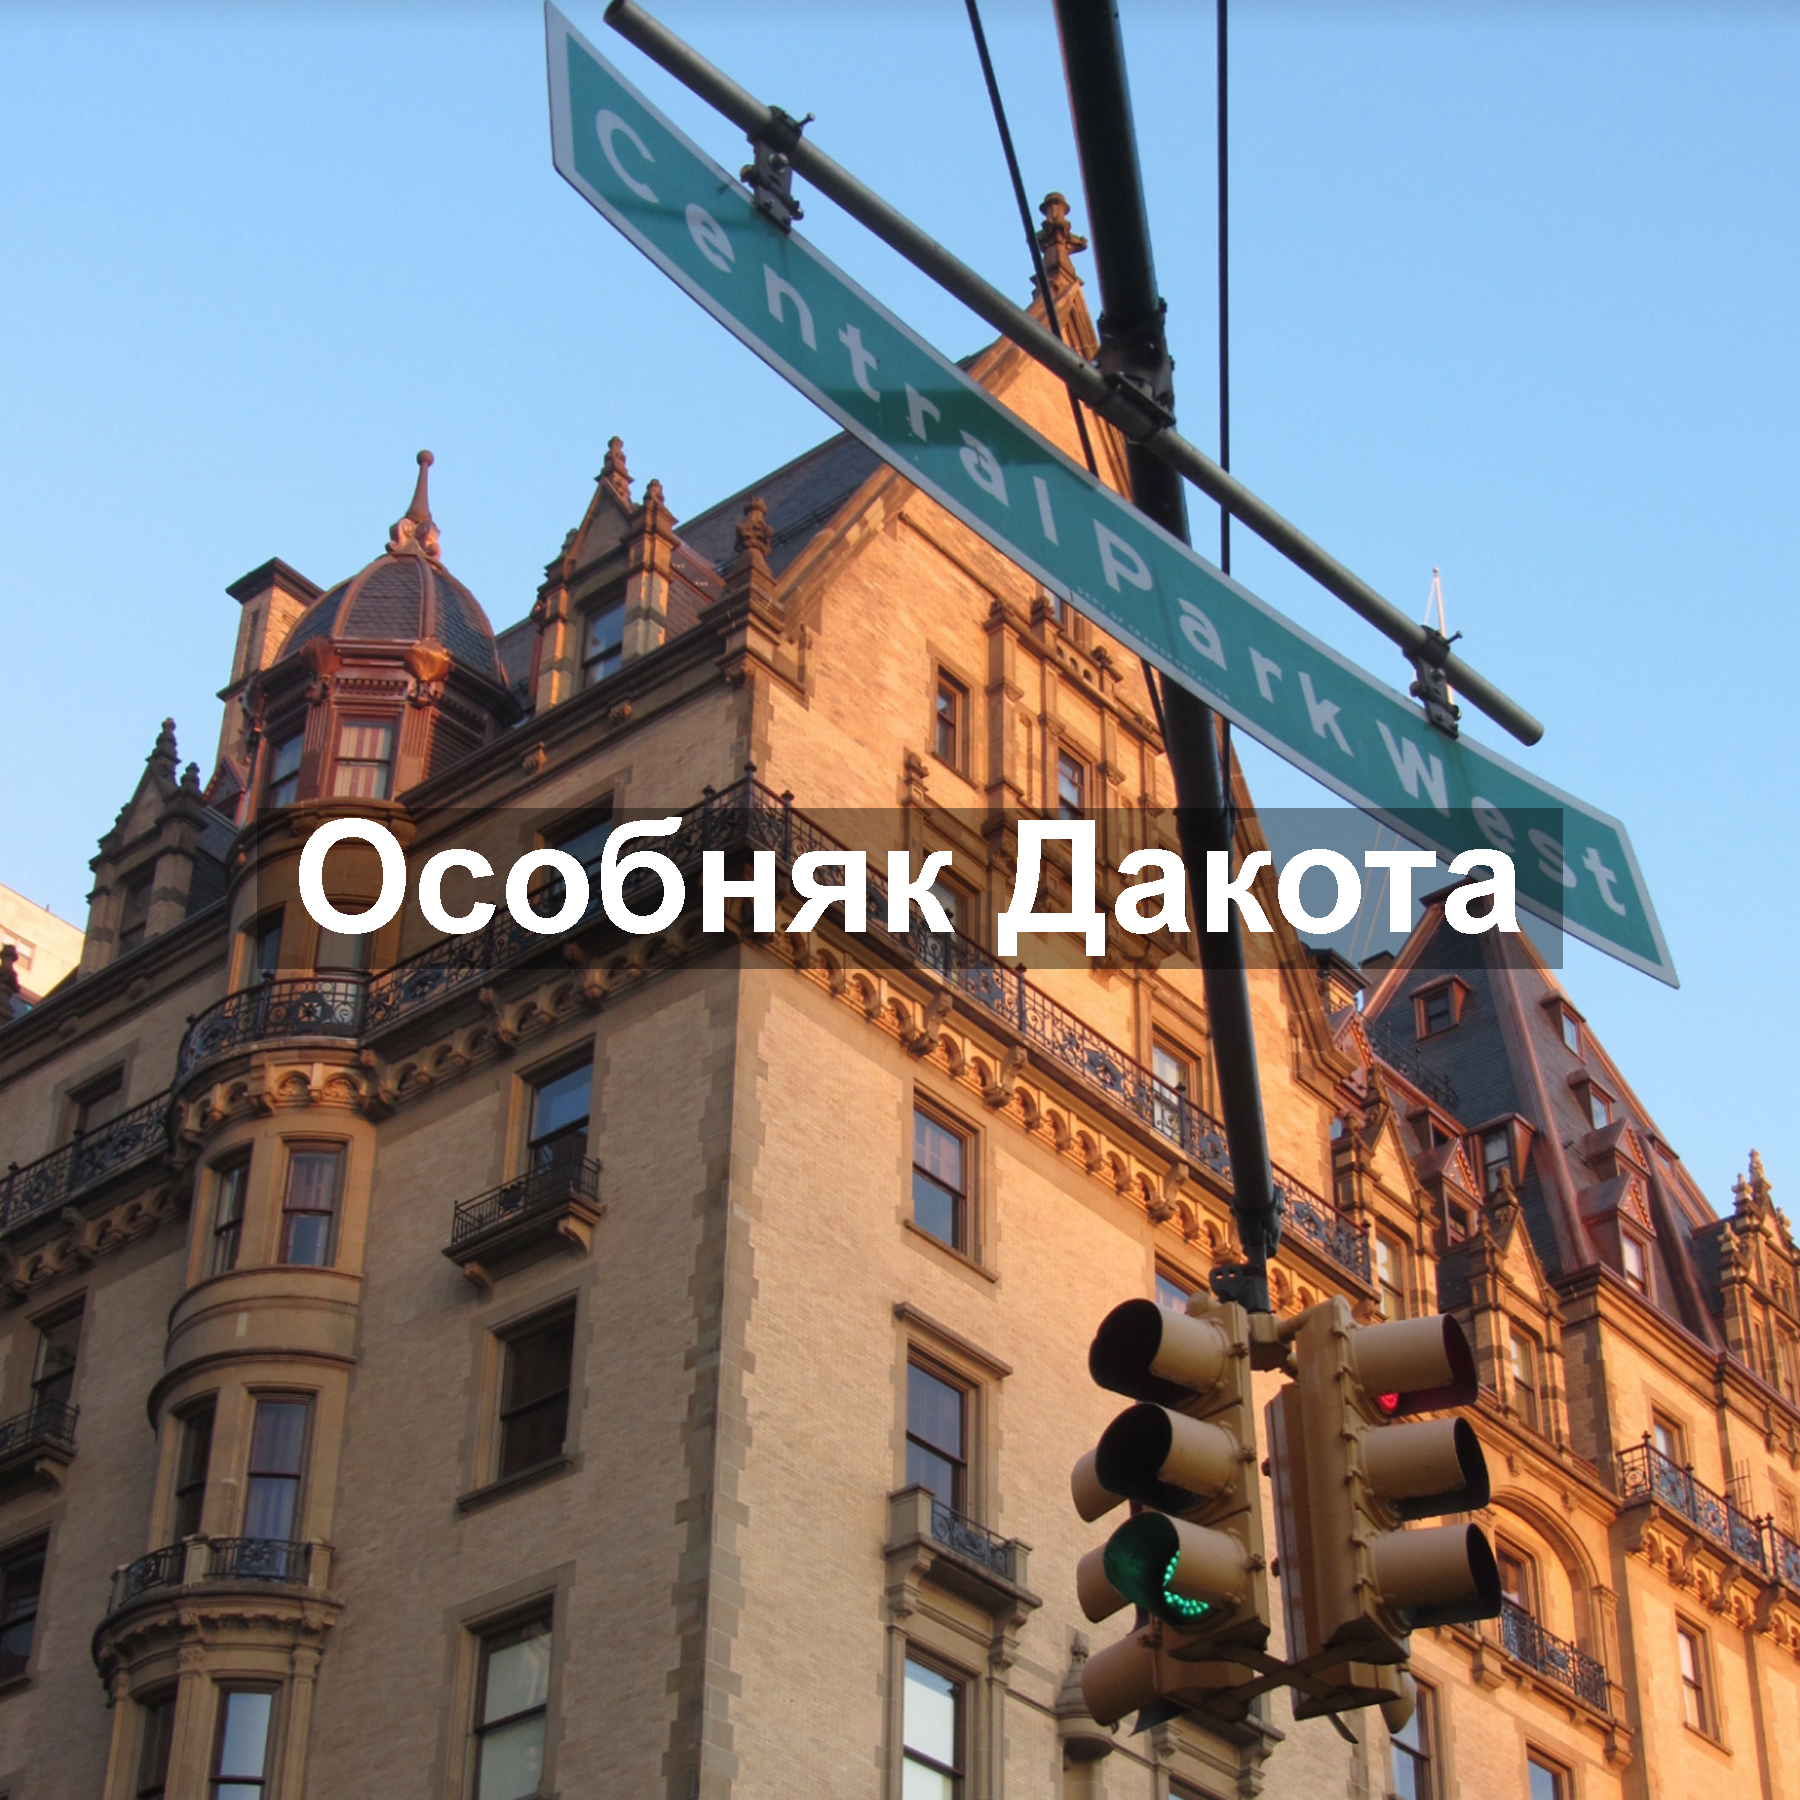 Особняк_Дакота_кинолокации_Ньюйоркгид_Иван_Федин.jpg